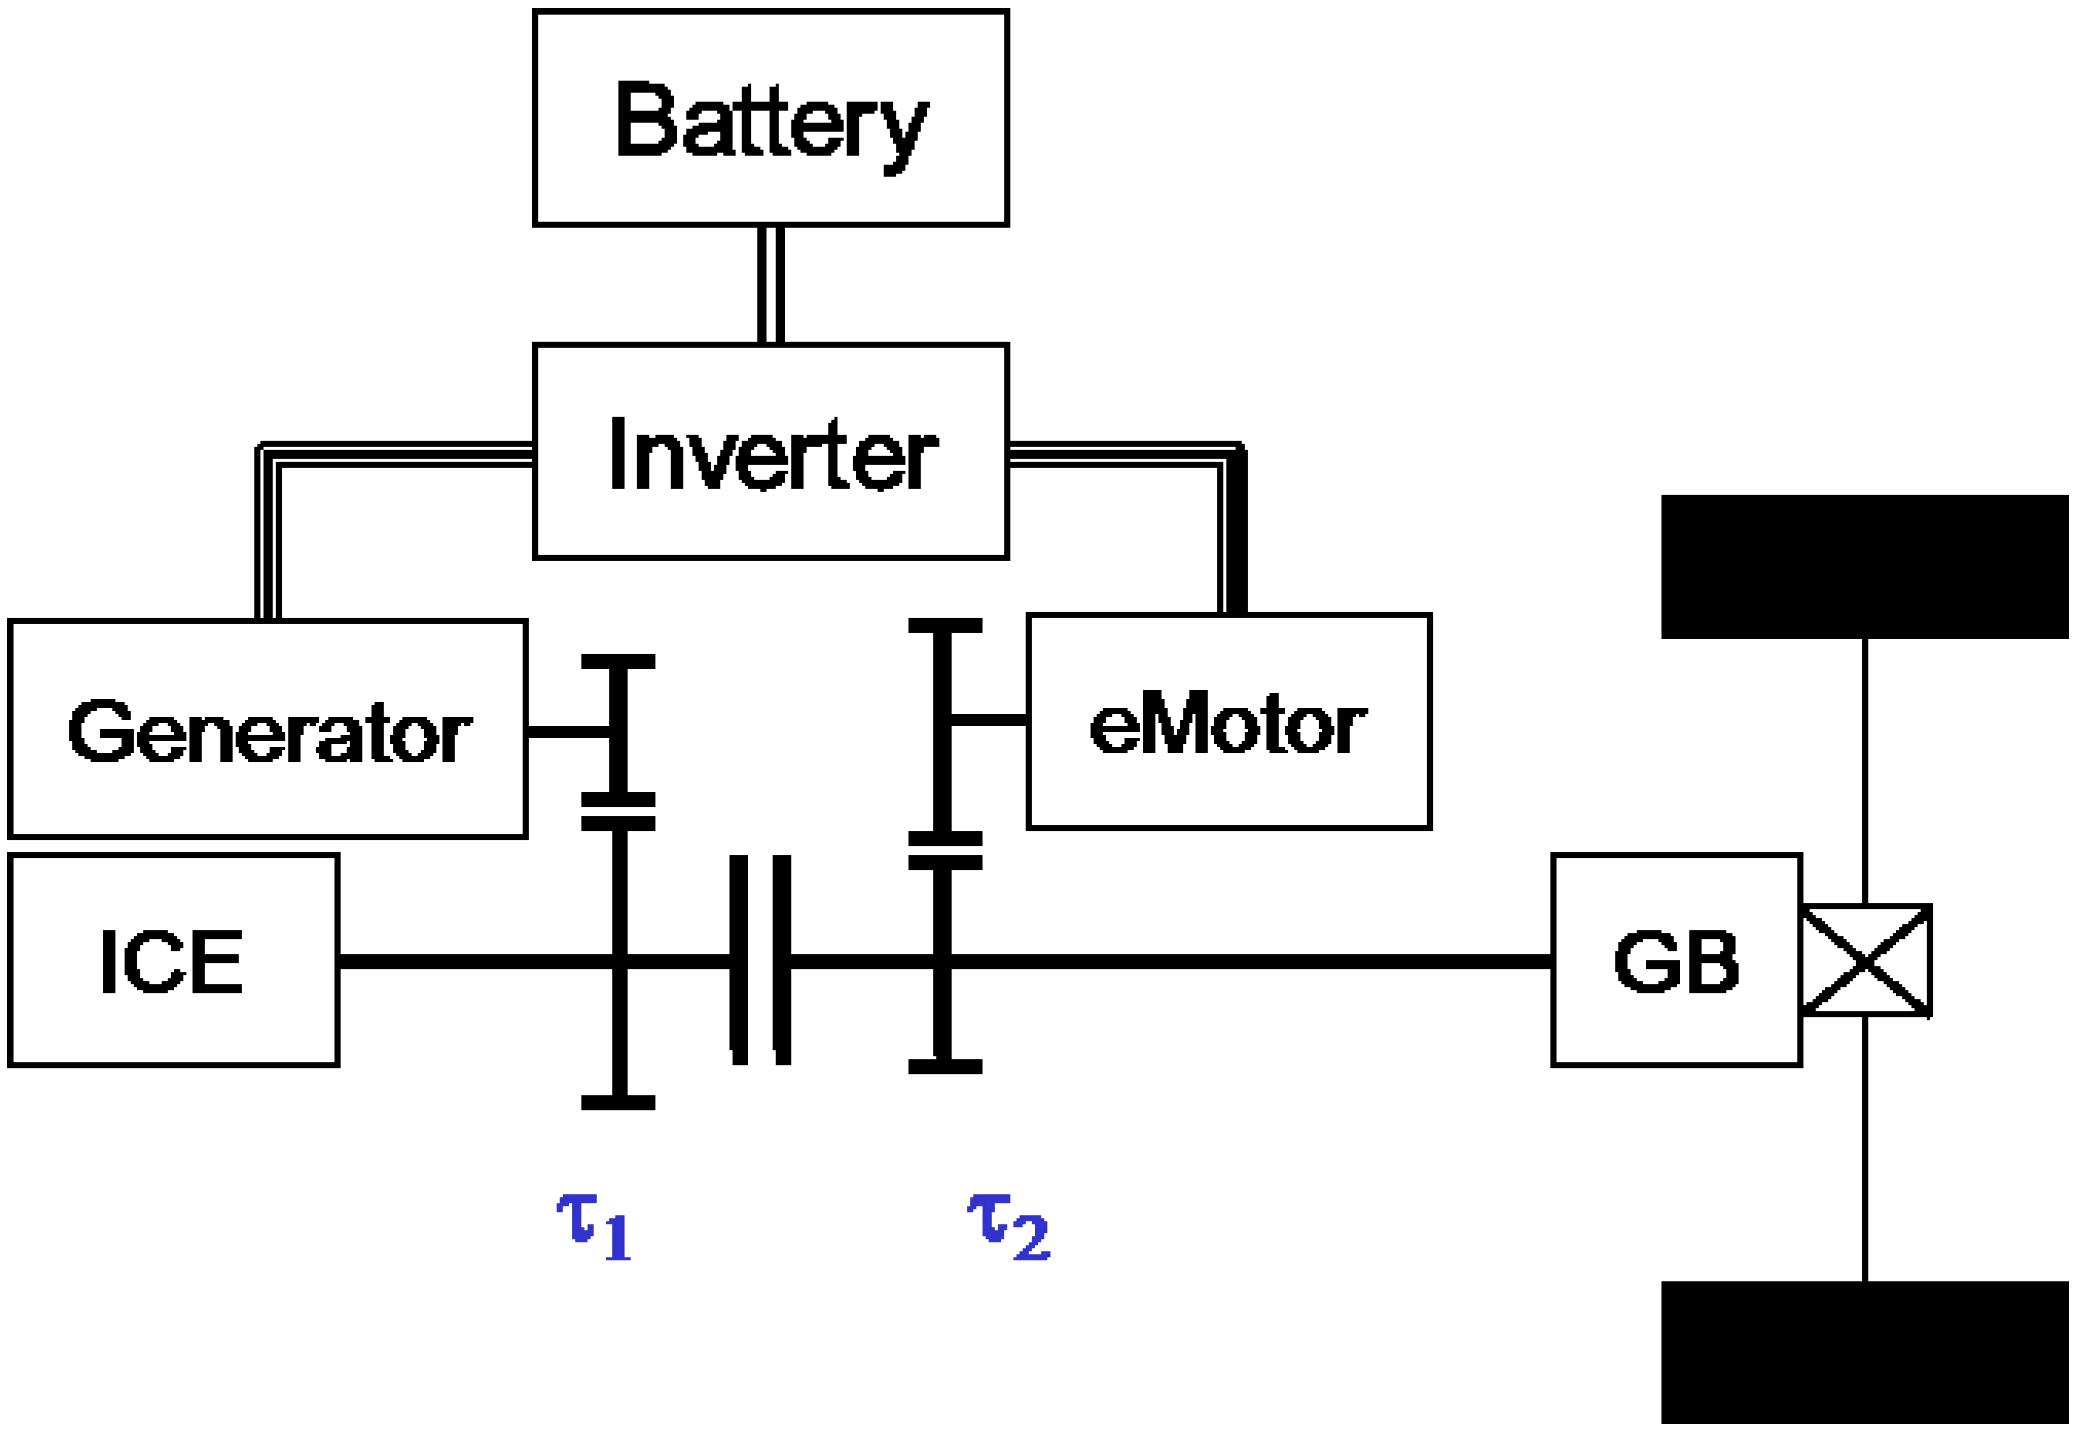 Toyota Production System Diagram. Toyota Production System Diagram. Wiring. Wiring Harness Design Guidelines At Justdesktopwallpapers.com